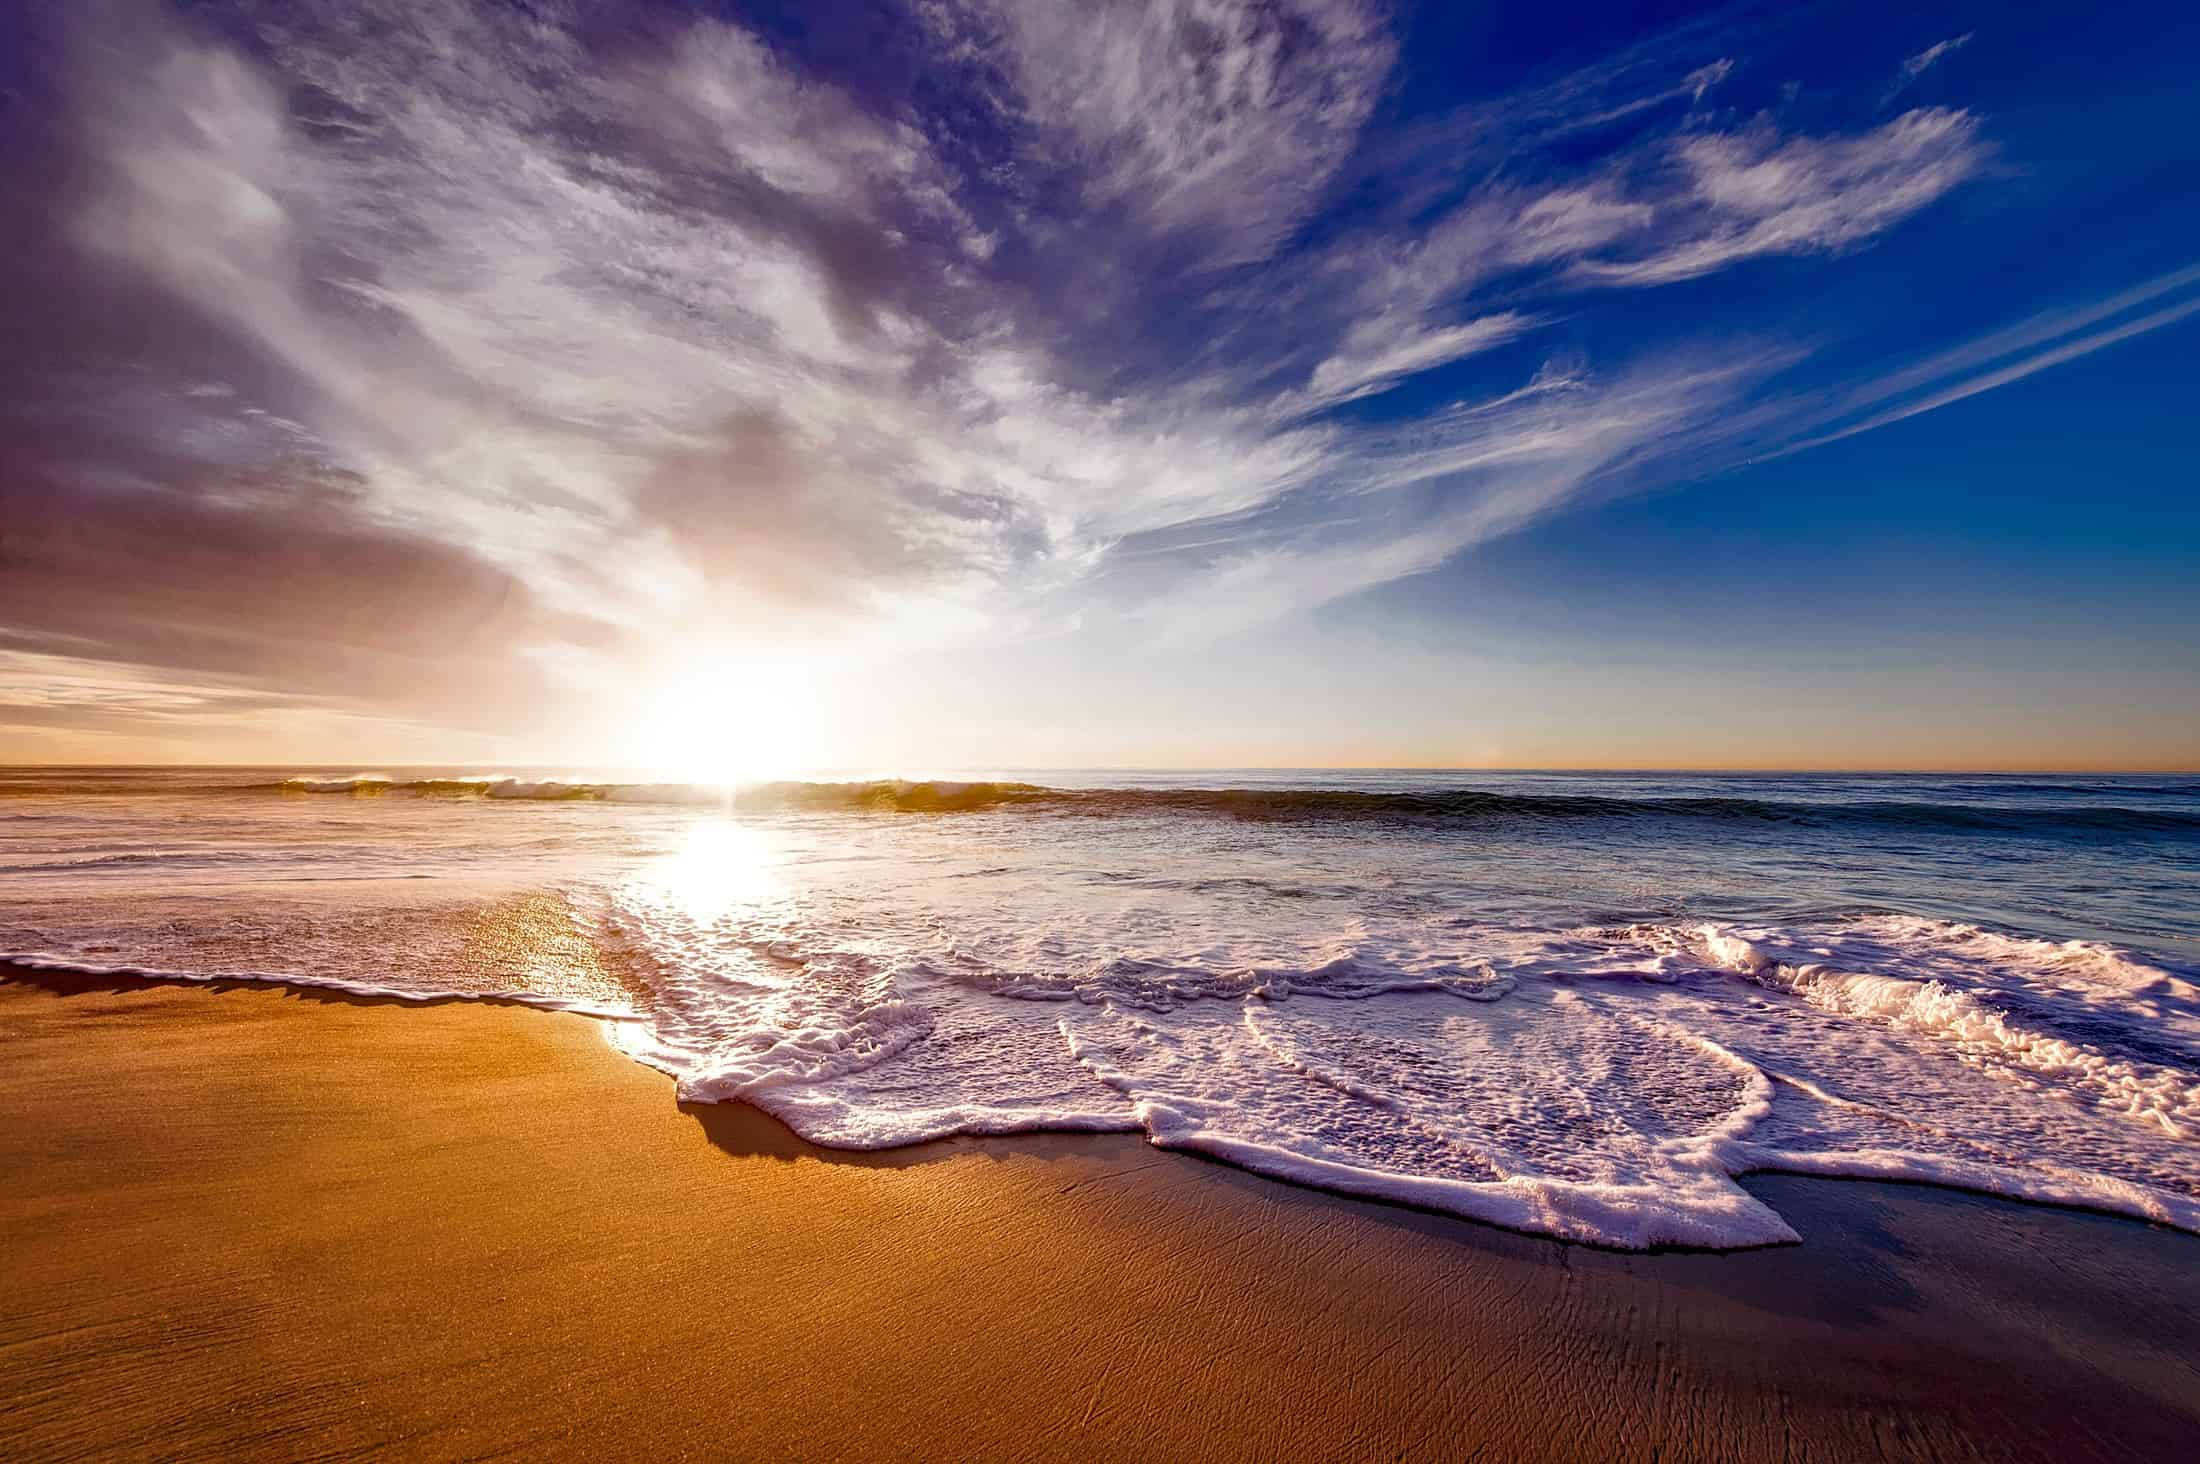 Pantai Mar Bella - pantai telanjang